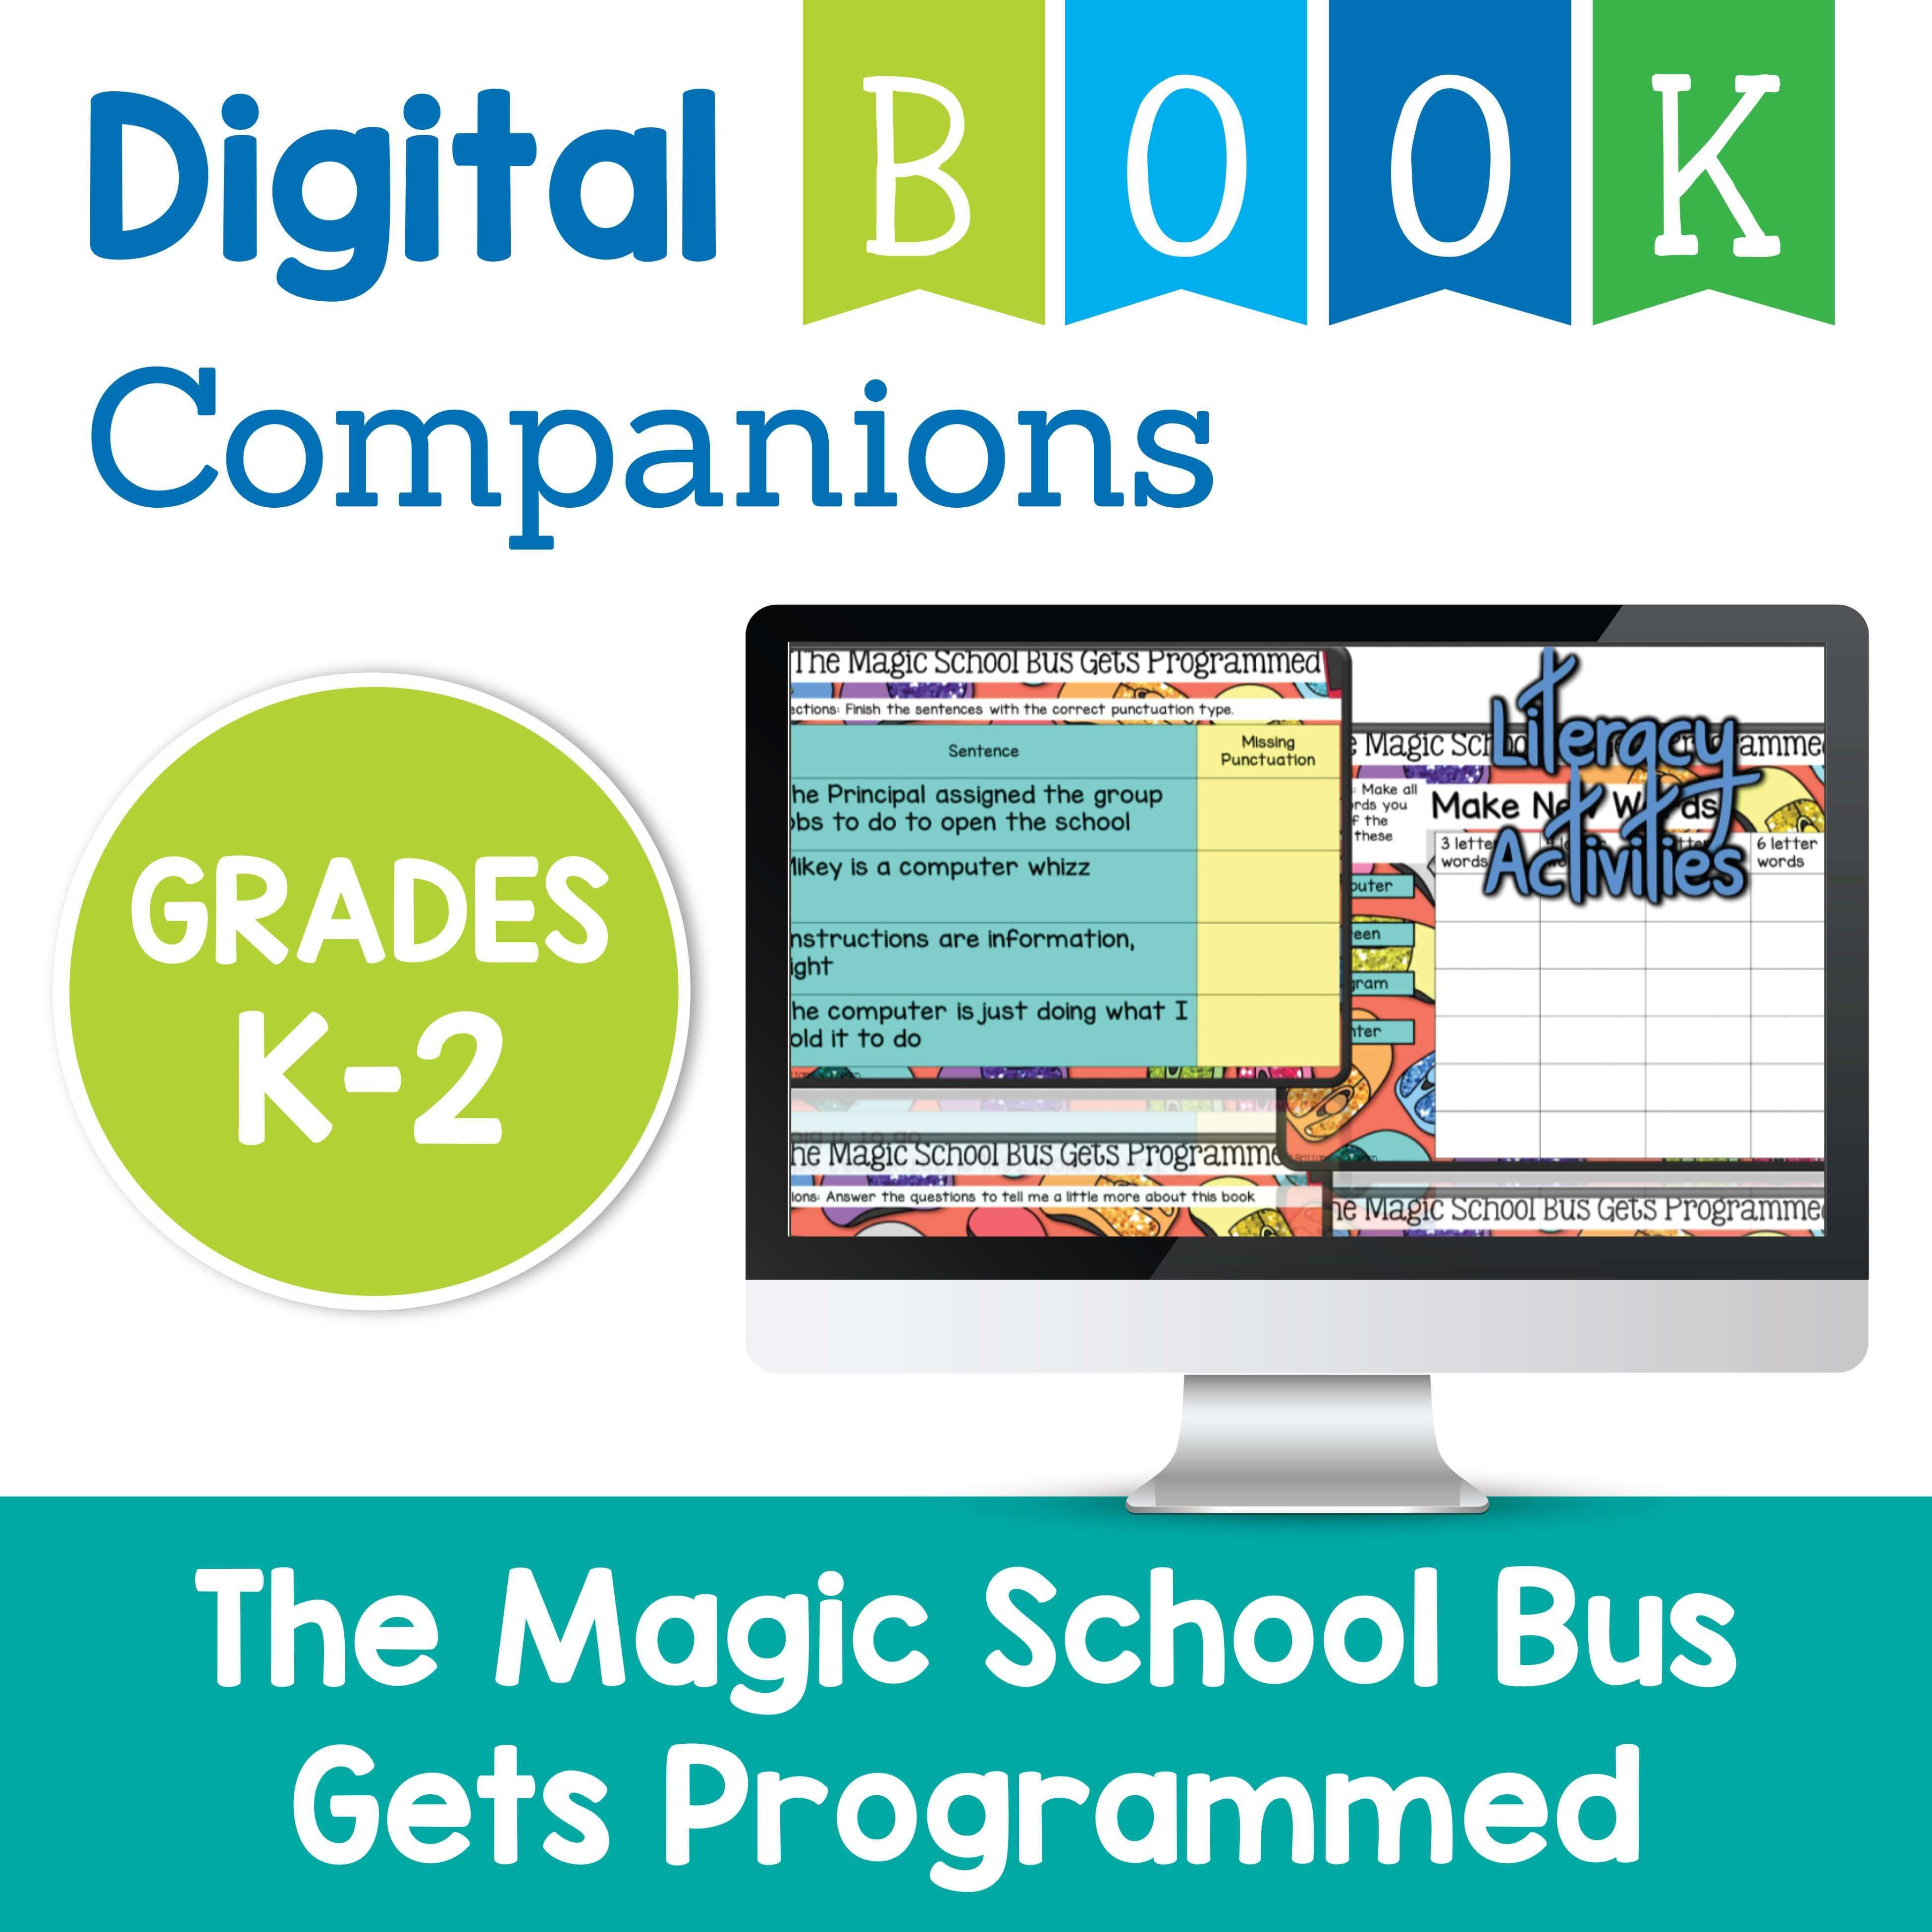 Msb Gets Programmed Digital Book Companion